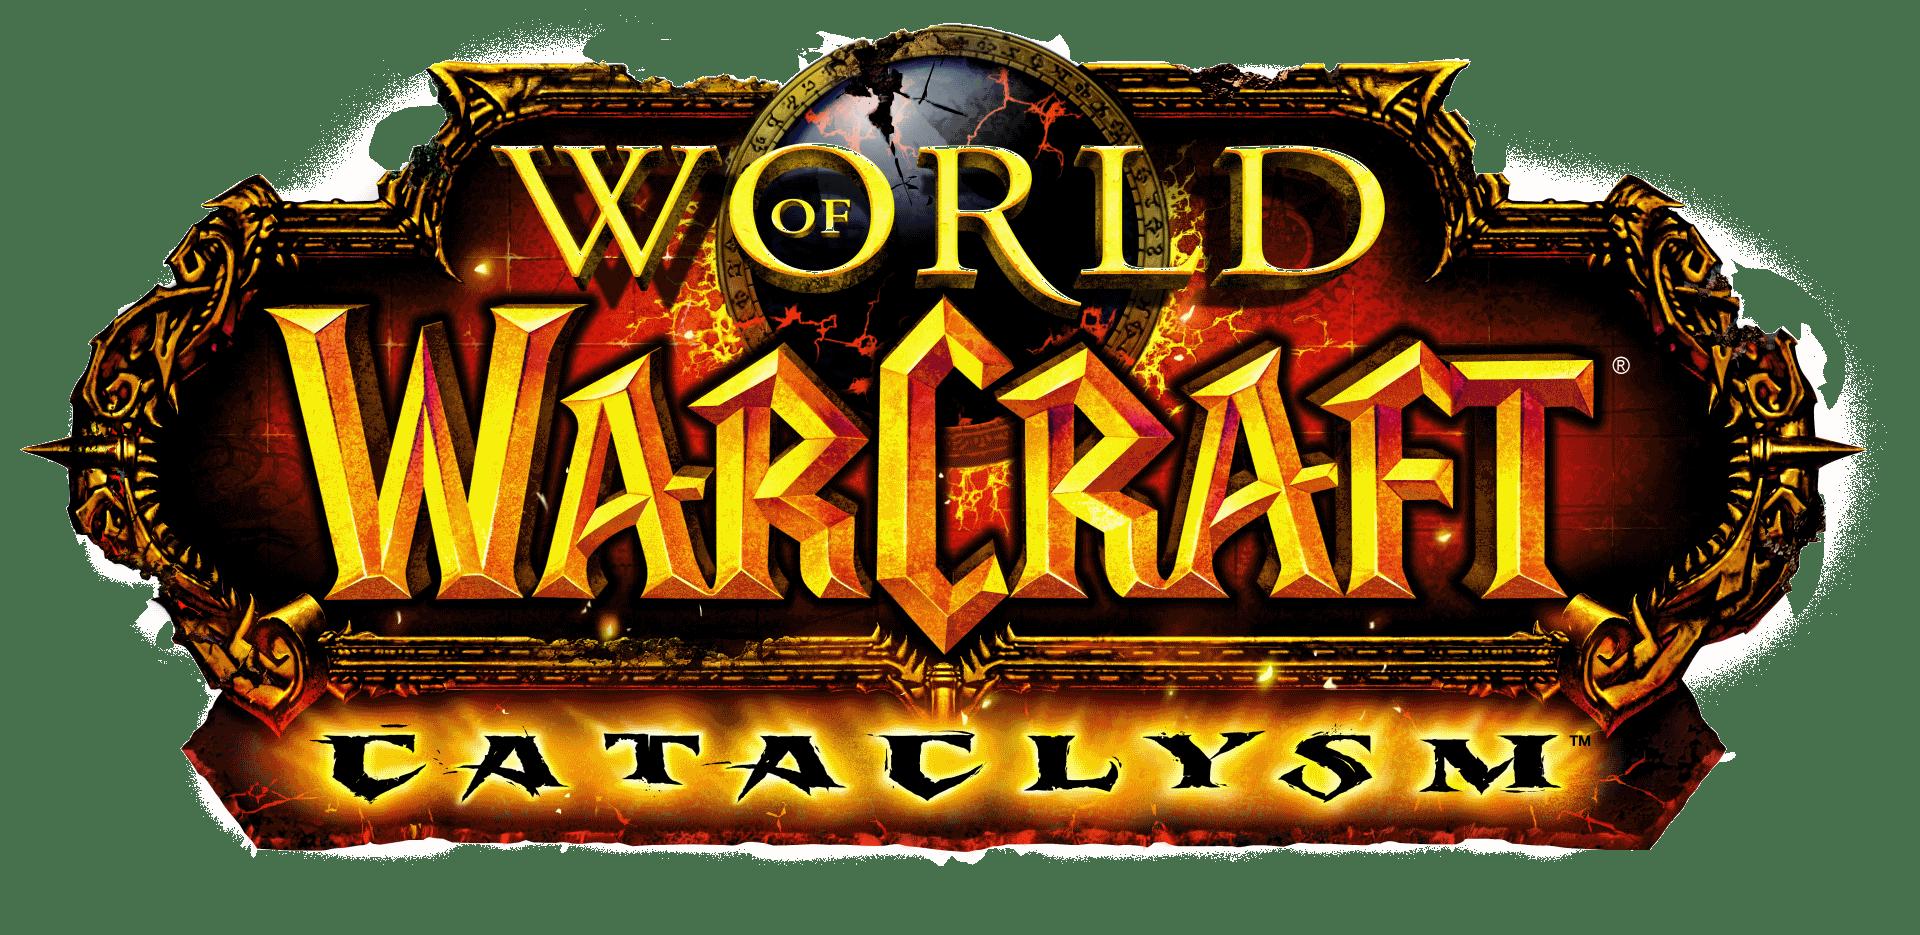 Of cataclysm logo transparent. Wow clipart world warcraft